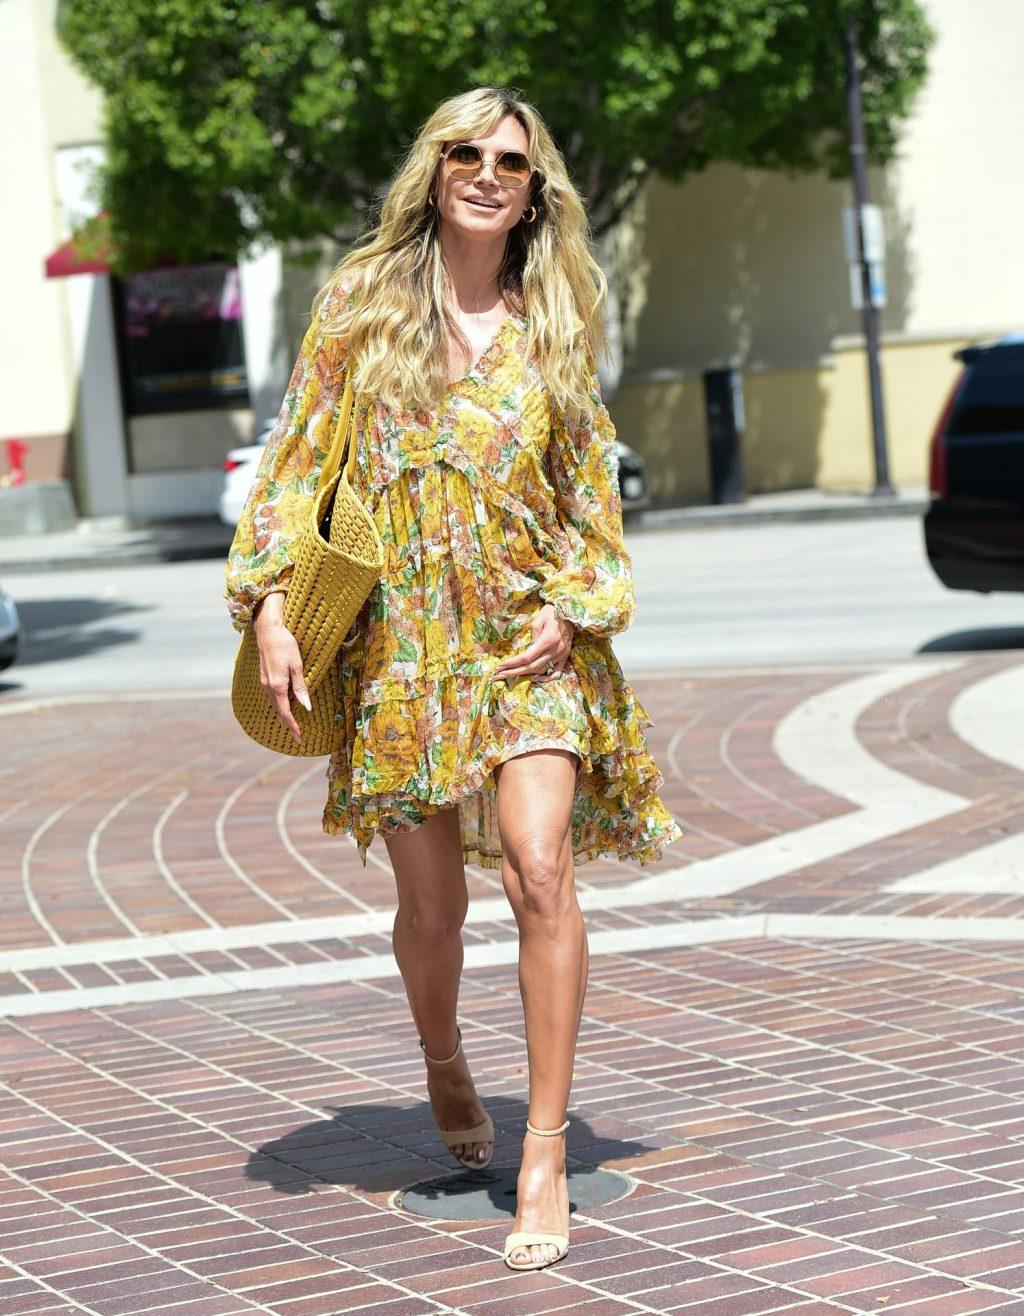 Leggy Heidi Klum Makes A Beautiful Arrival At AGT Taping